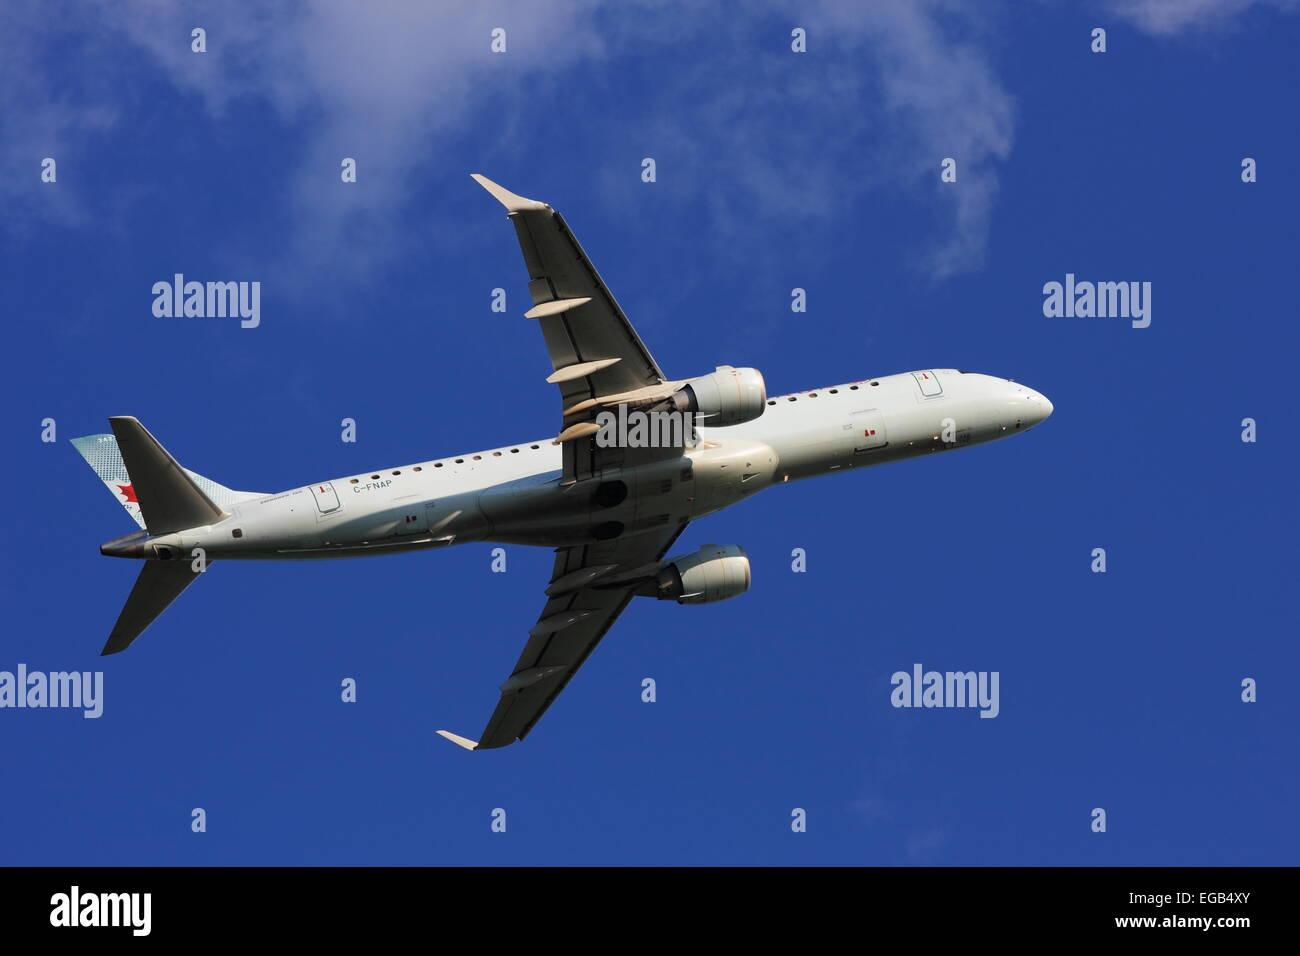 Embraer E190 C-FNAP Air Canada departs YOW Ottawa Canada, July 5, 2014 - Stock Image